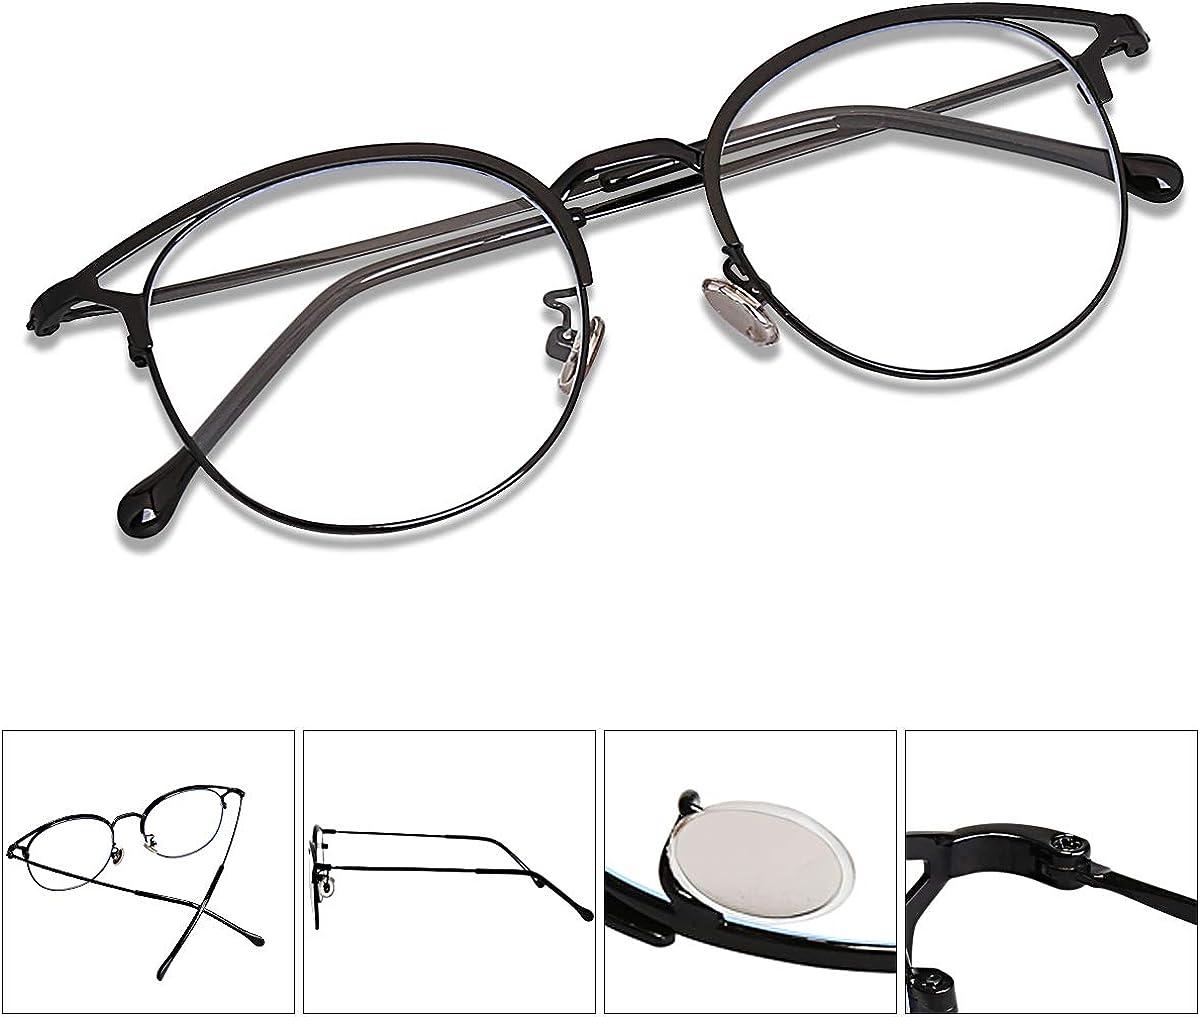 SOJOS Montatura Occhiali da Vista Donna Vintage Occhiali per Computer Anti Luce Blu Cateye Rotondi Anti-affaticamento Antiriflesso SJ5035 Oasis